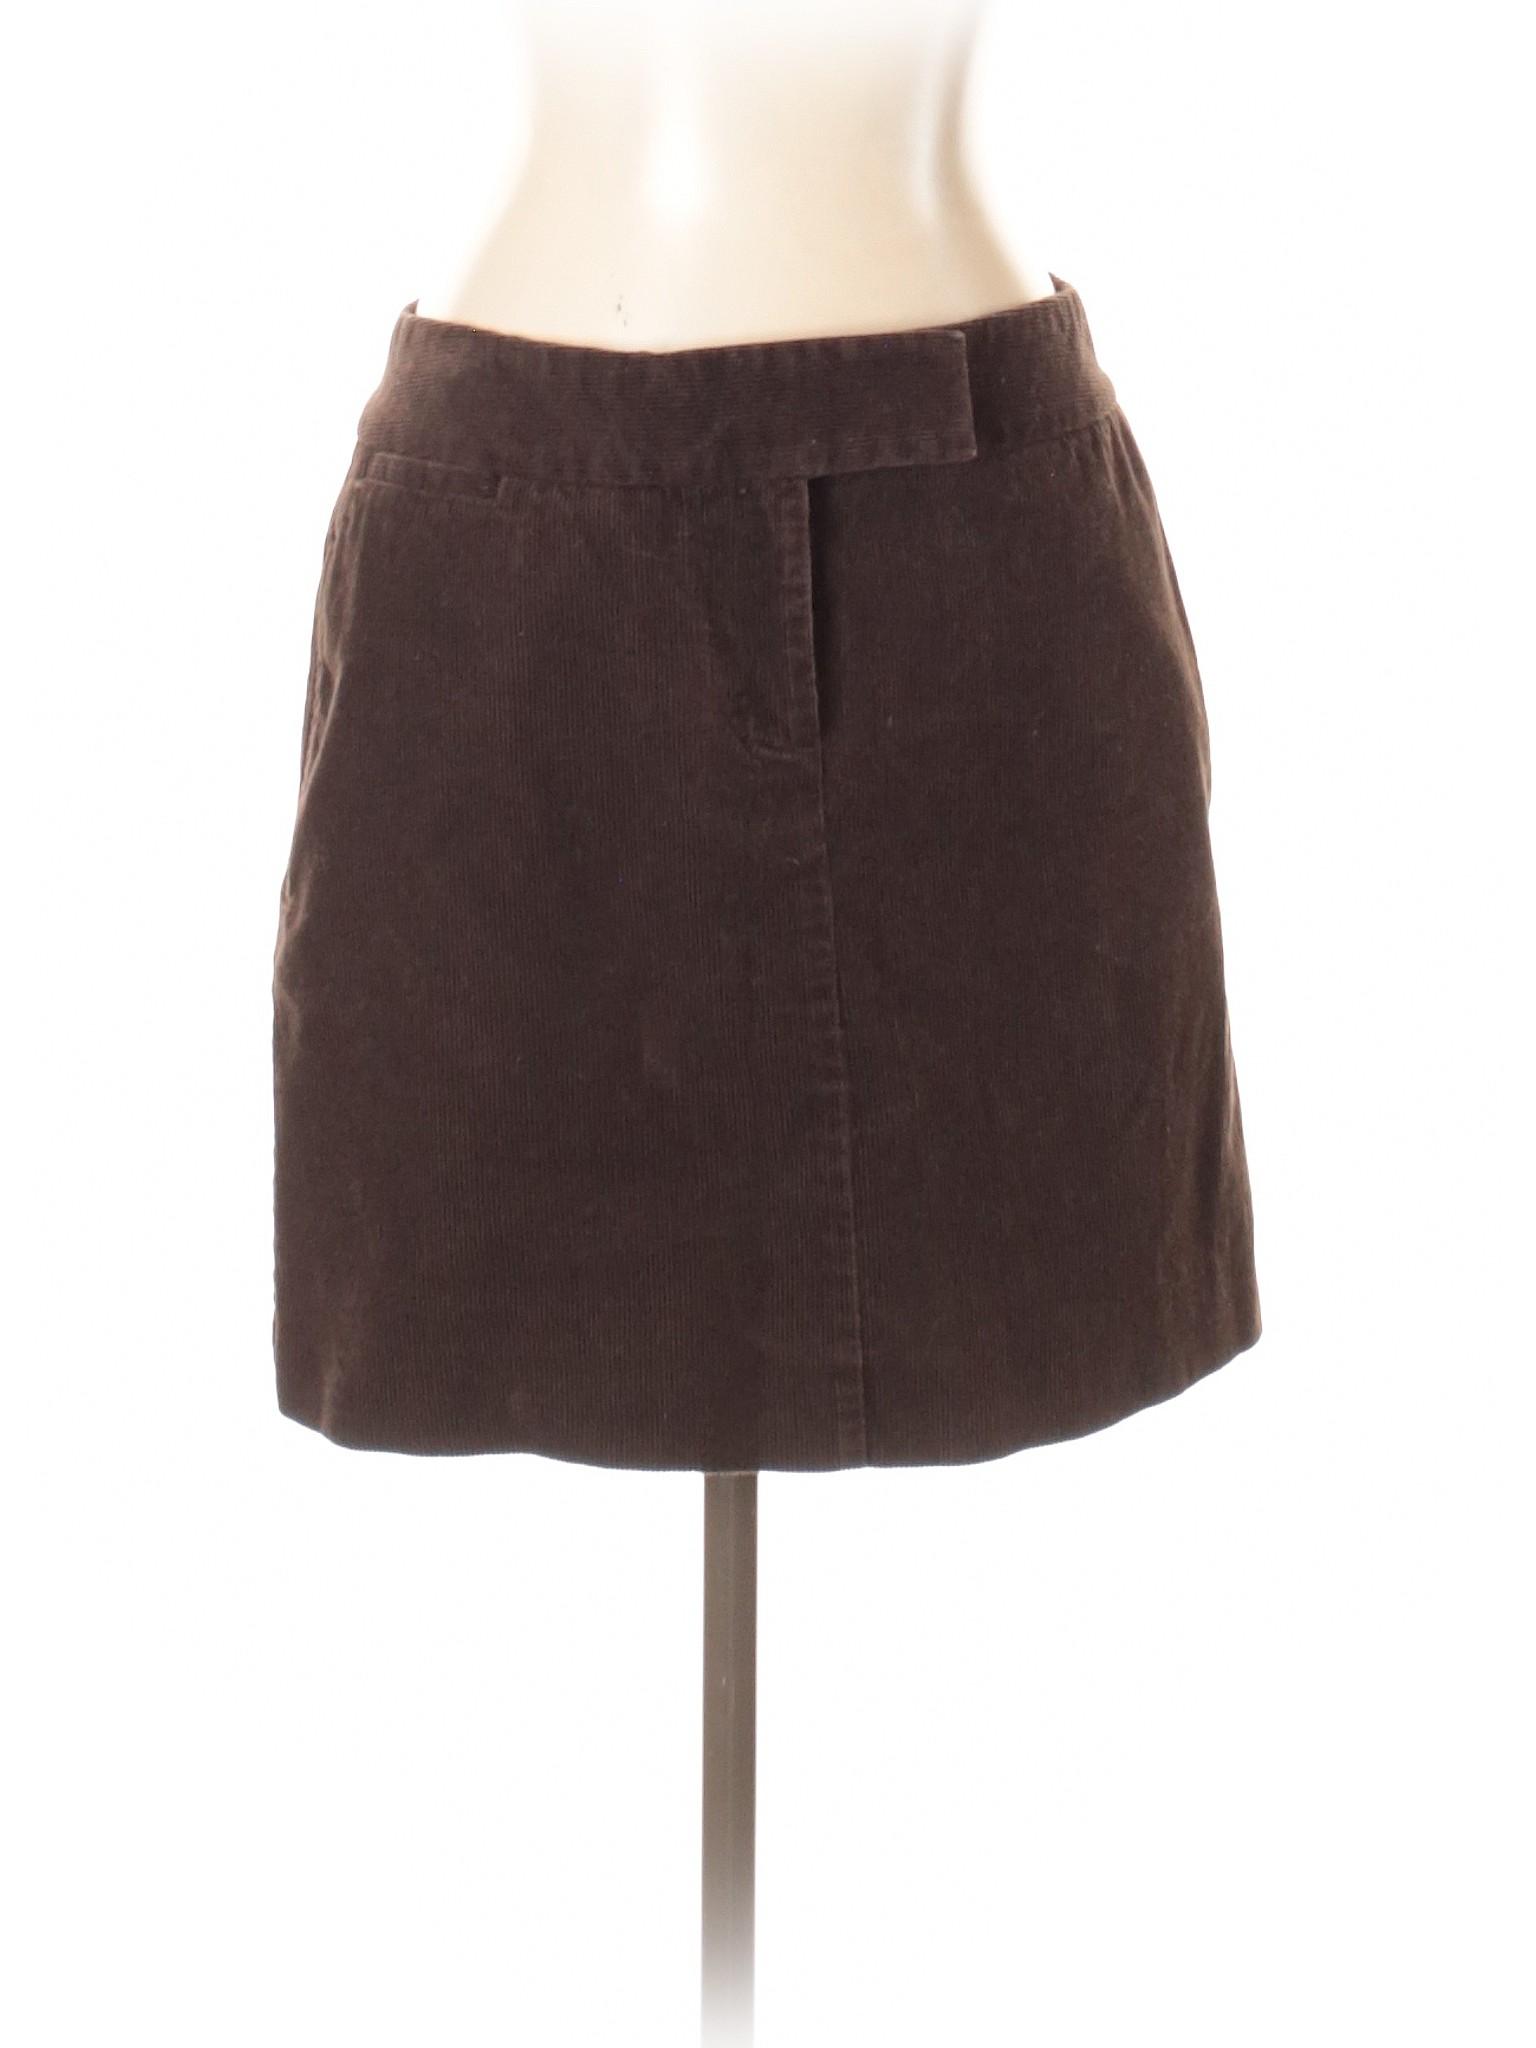 J Boutique Skirt Boutique J Crew Casual nPx6Pp0wqY